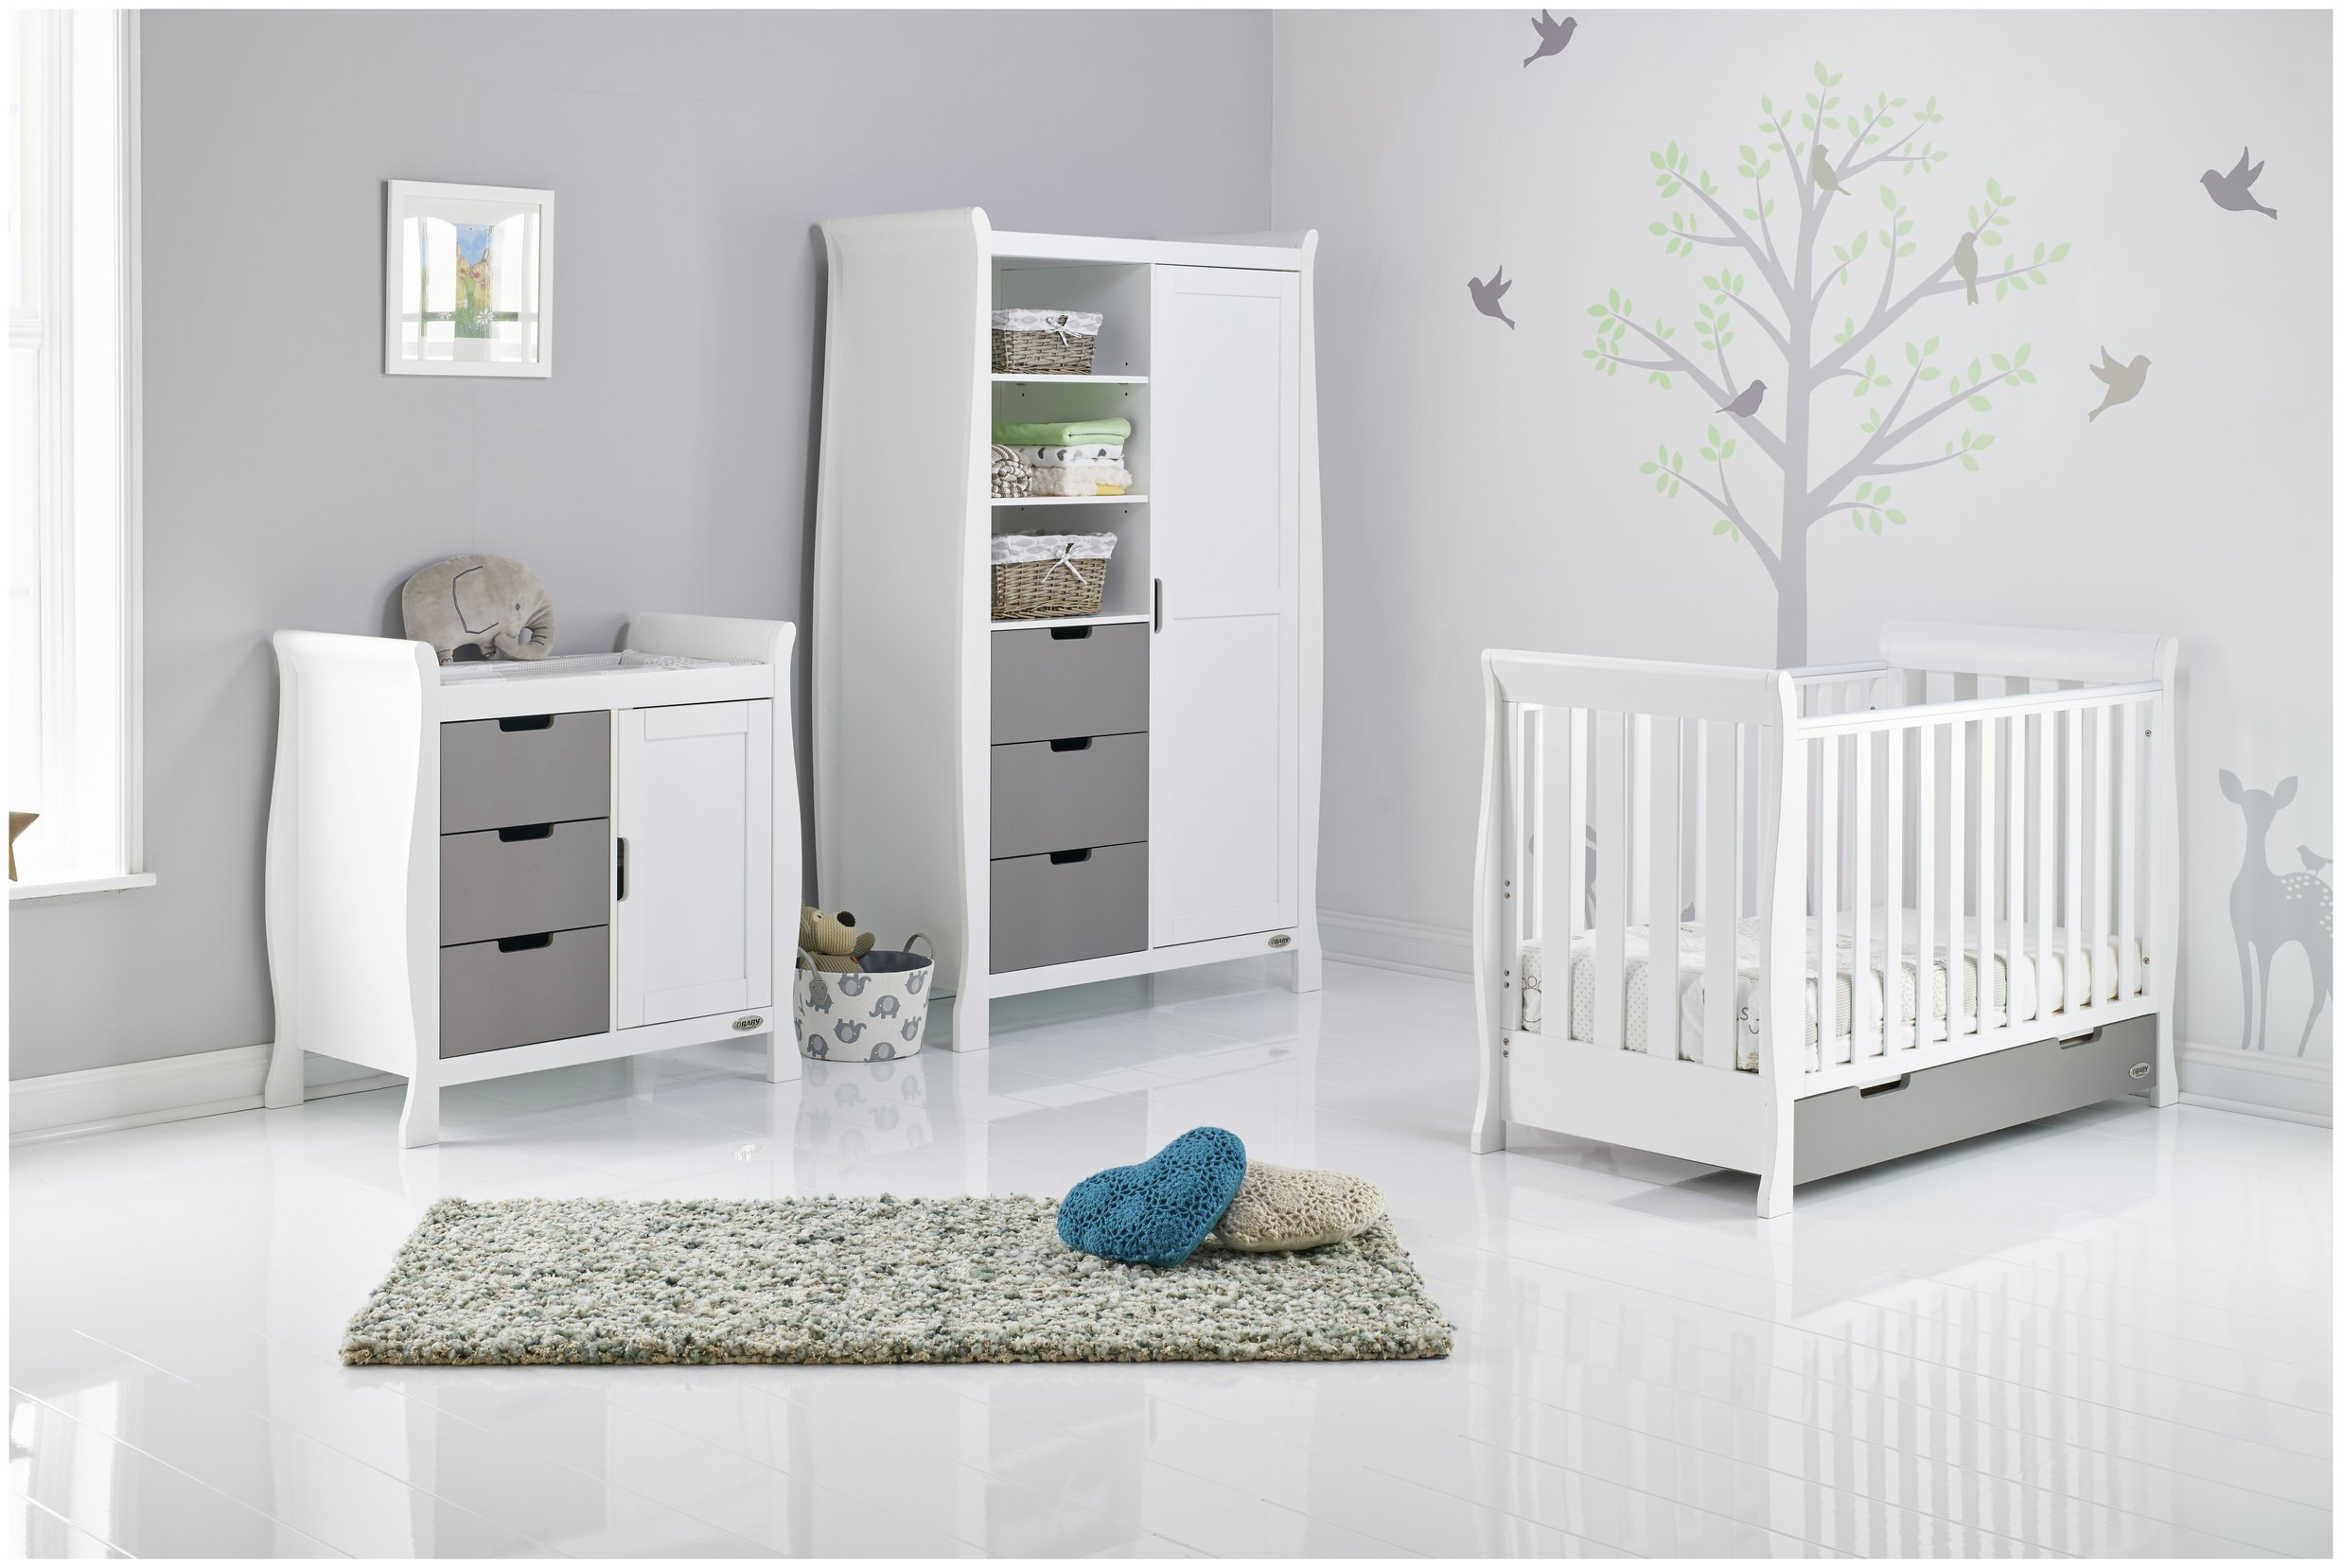 Obaby Stamford Mini Sleigh 3 Piece Room Set - White & Grey